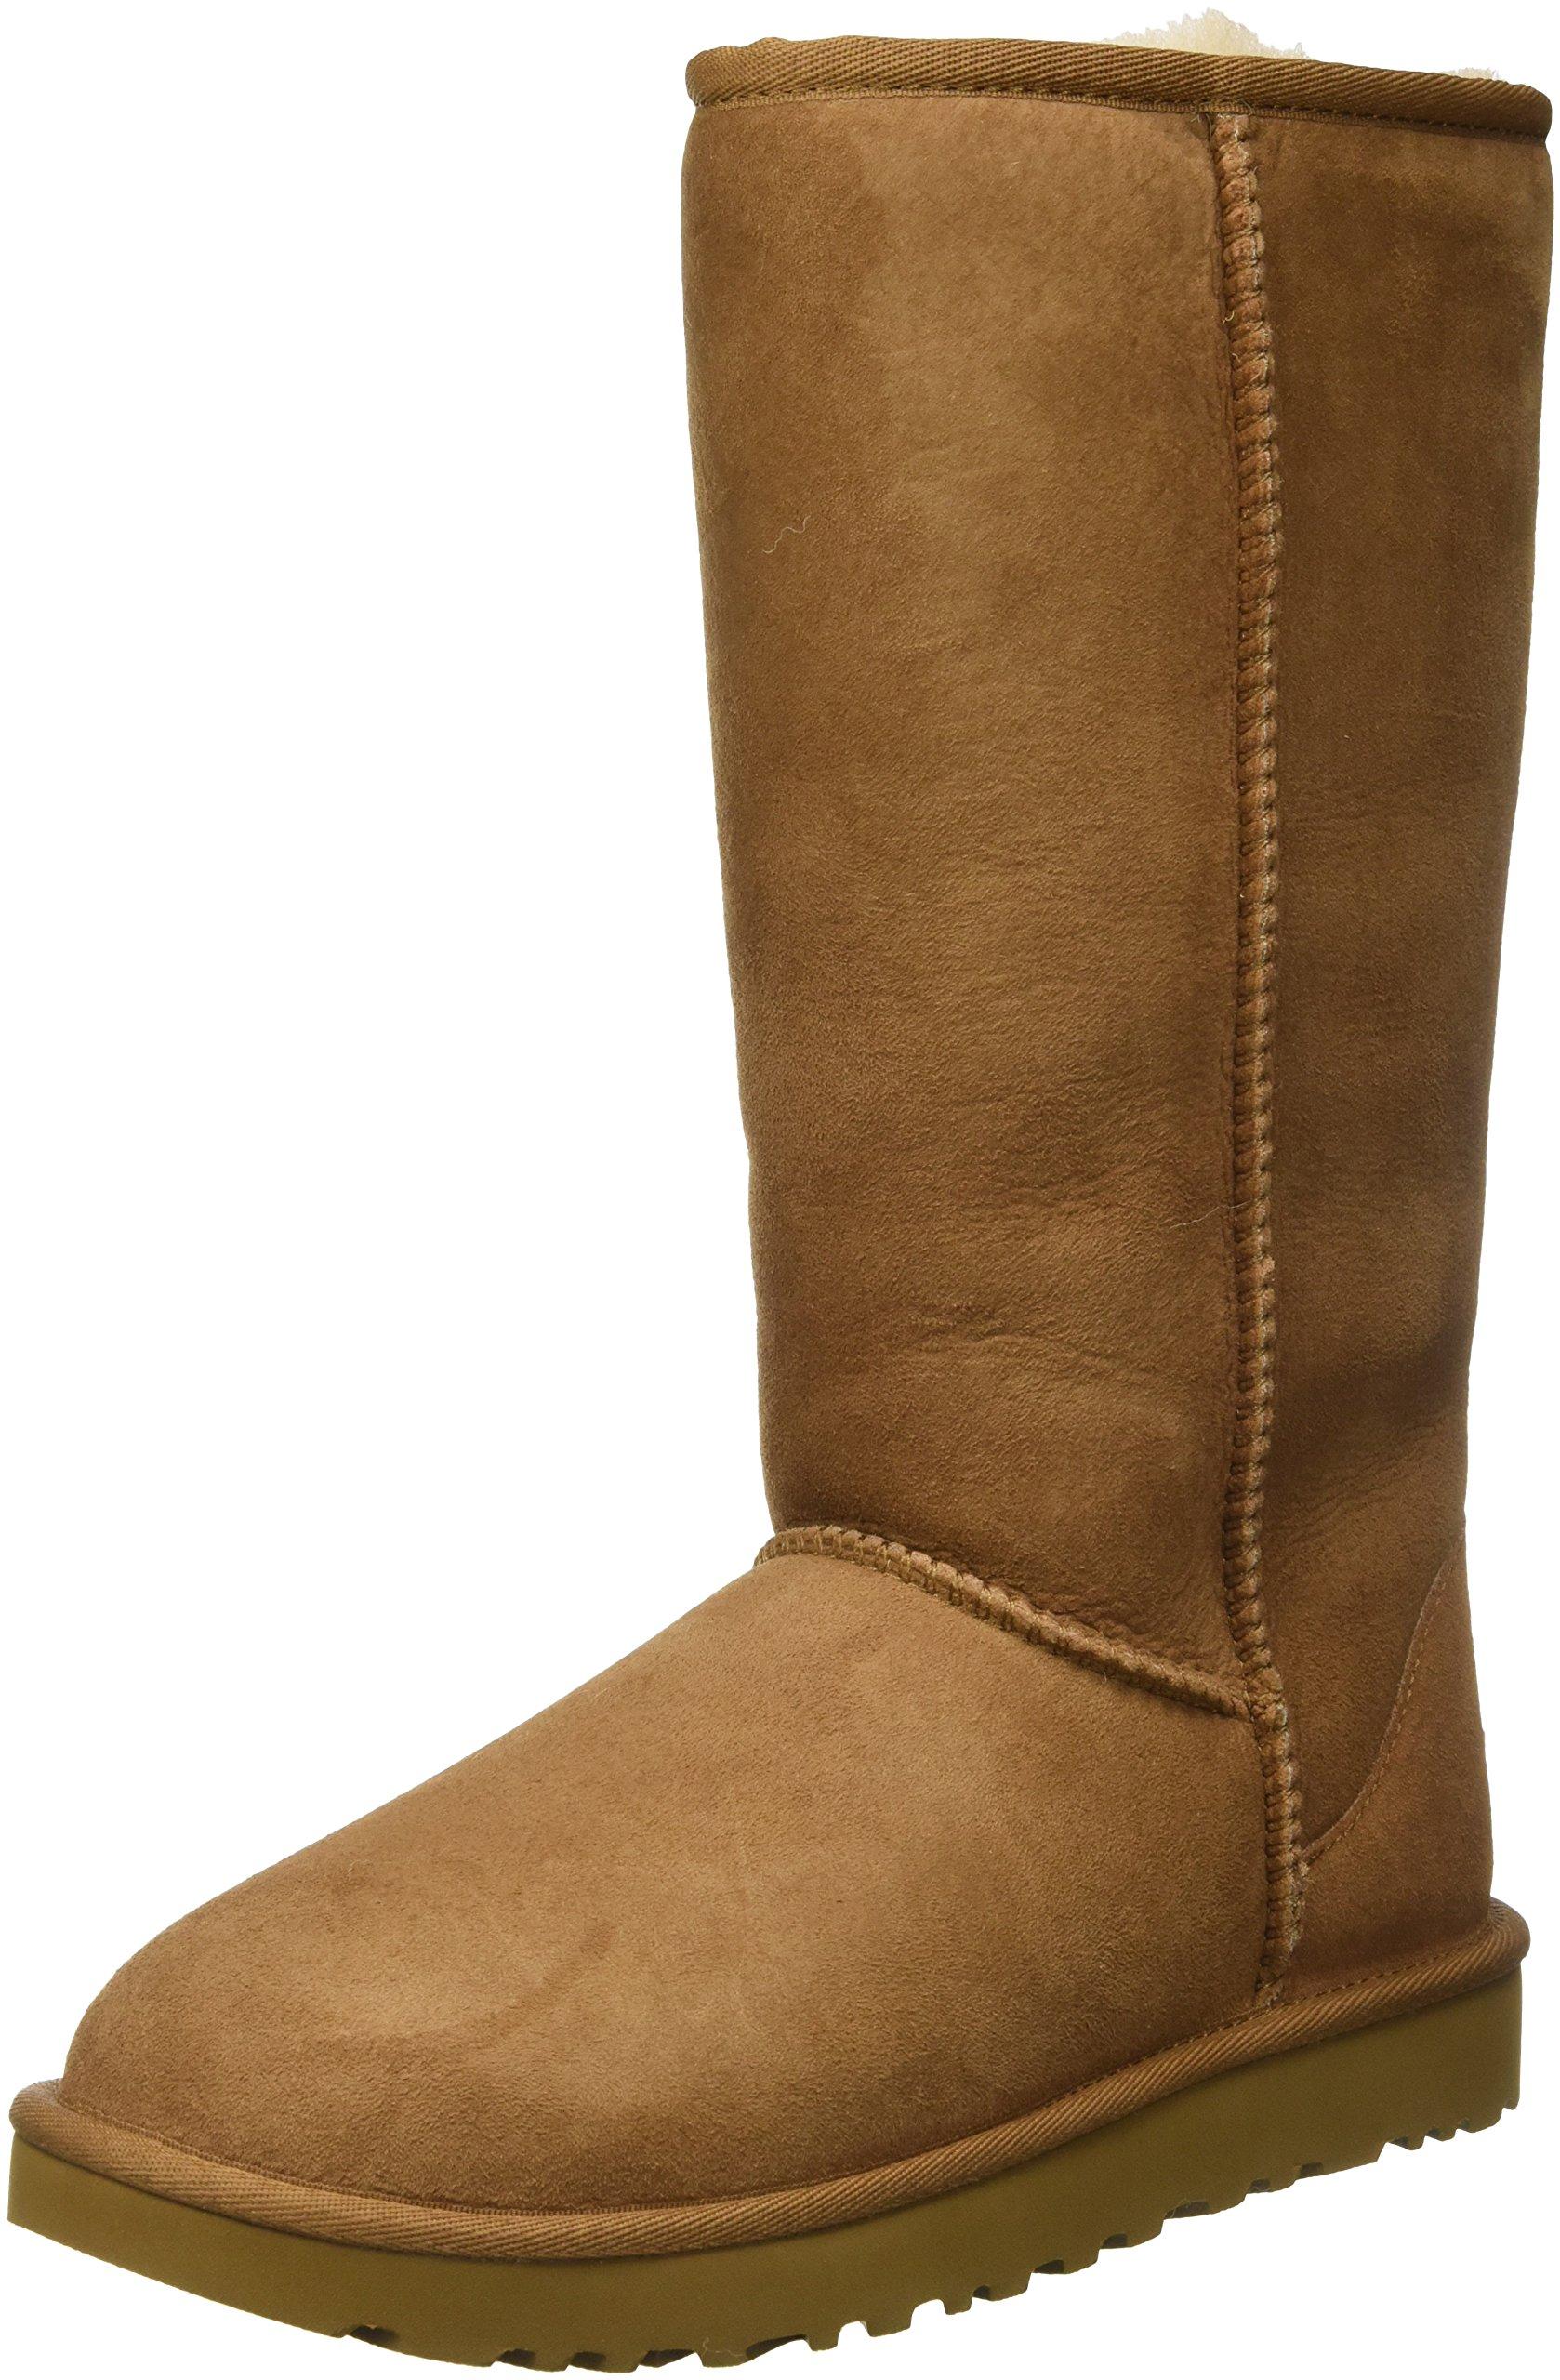 women s ugg boots amazon com rh amazon com